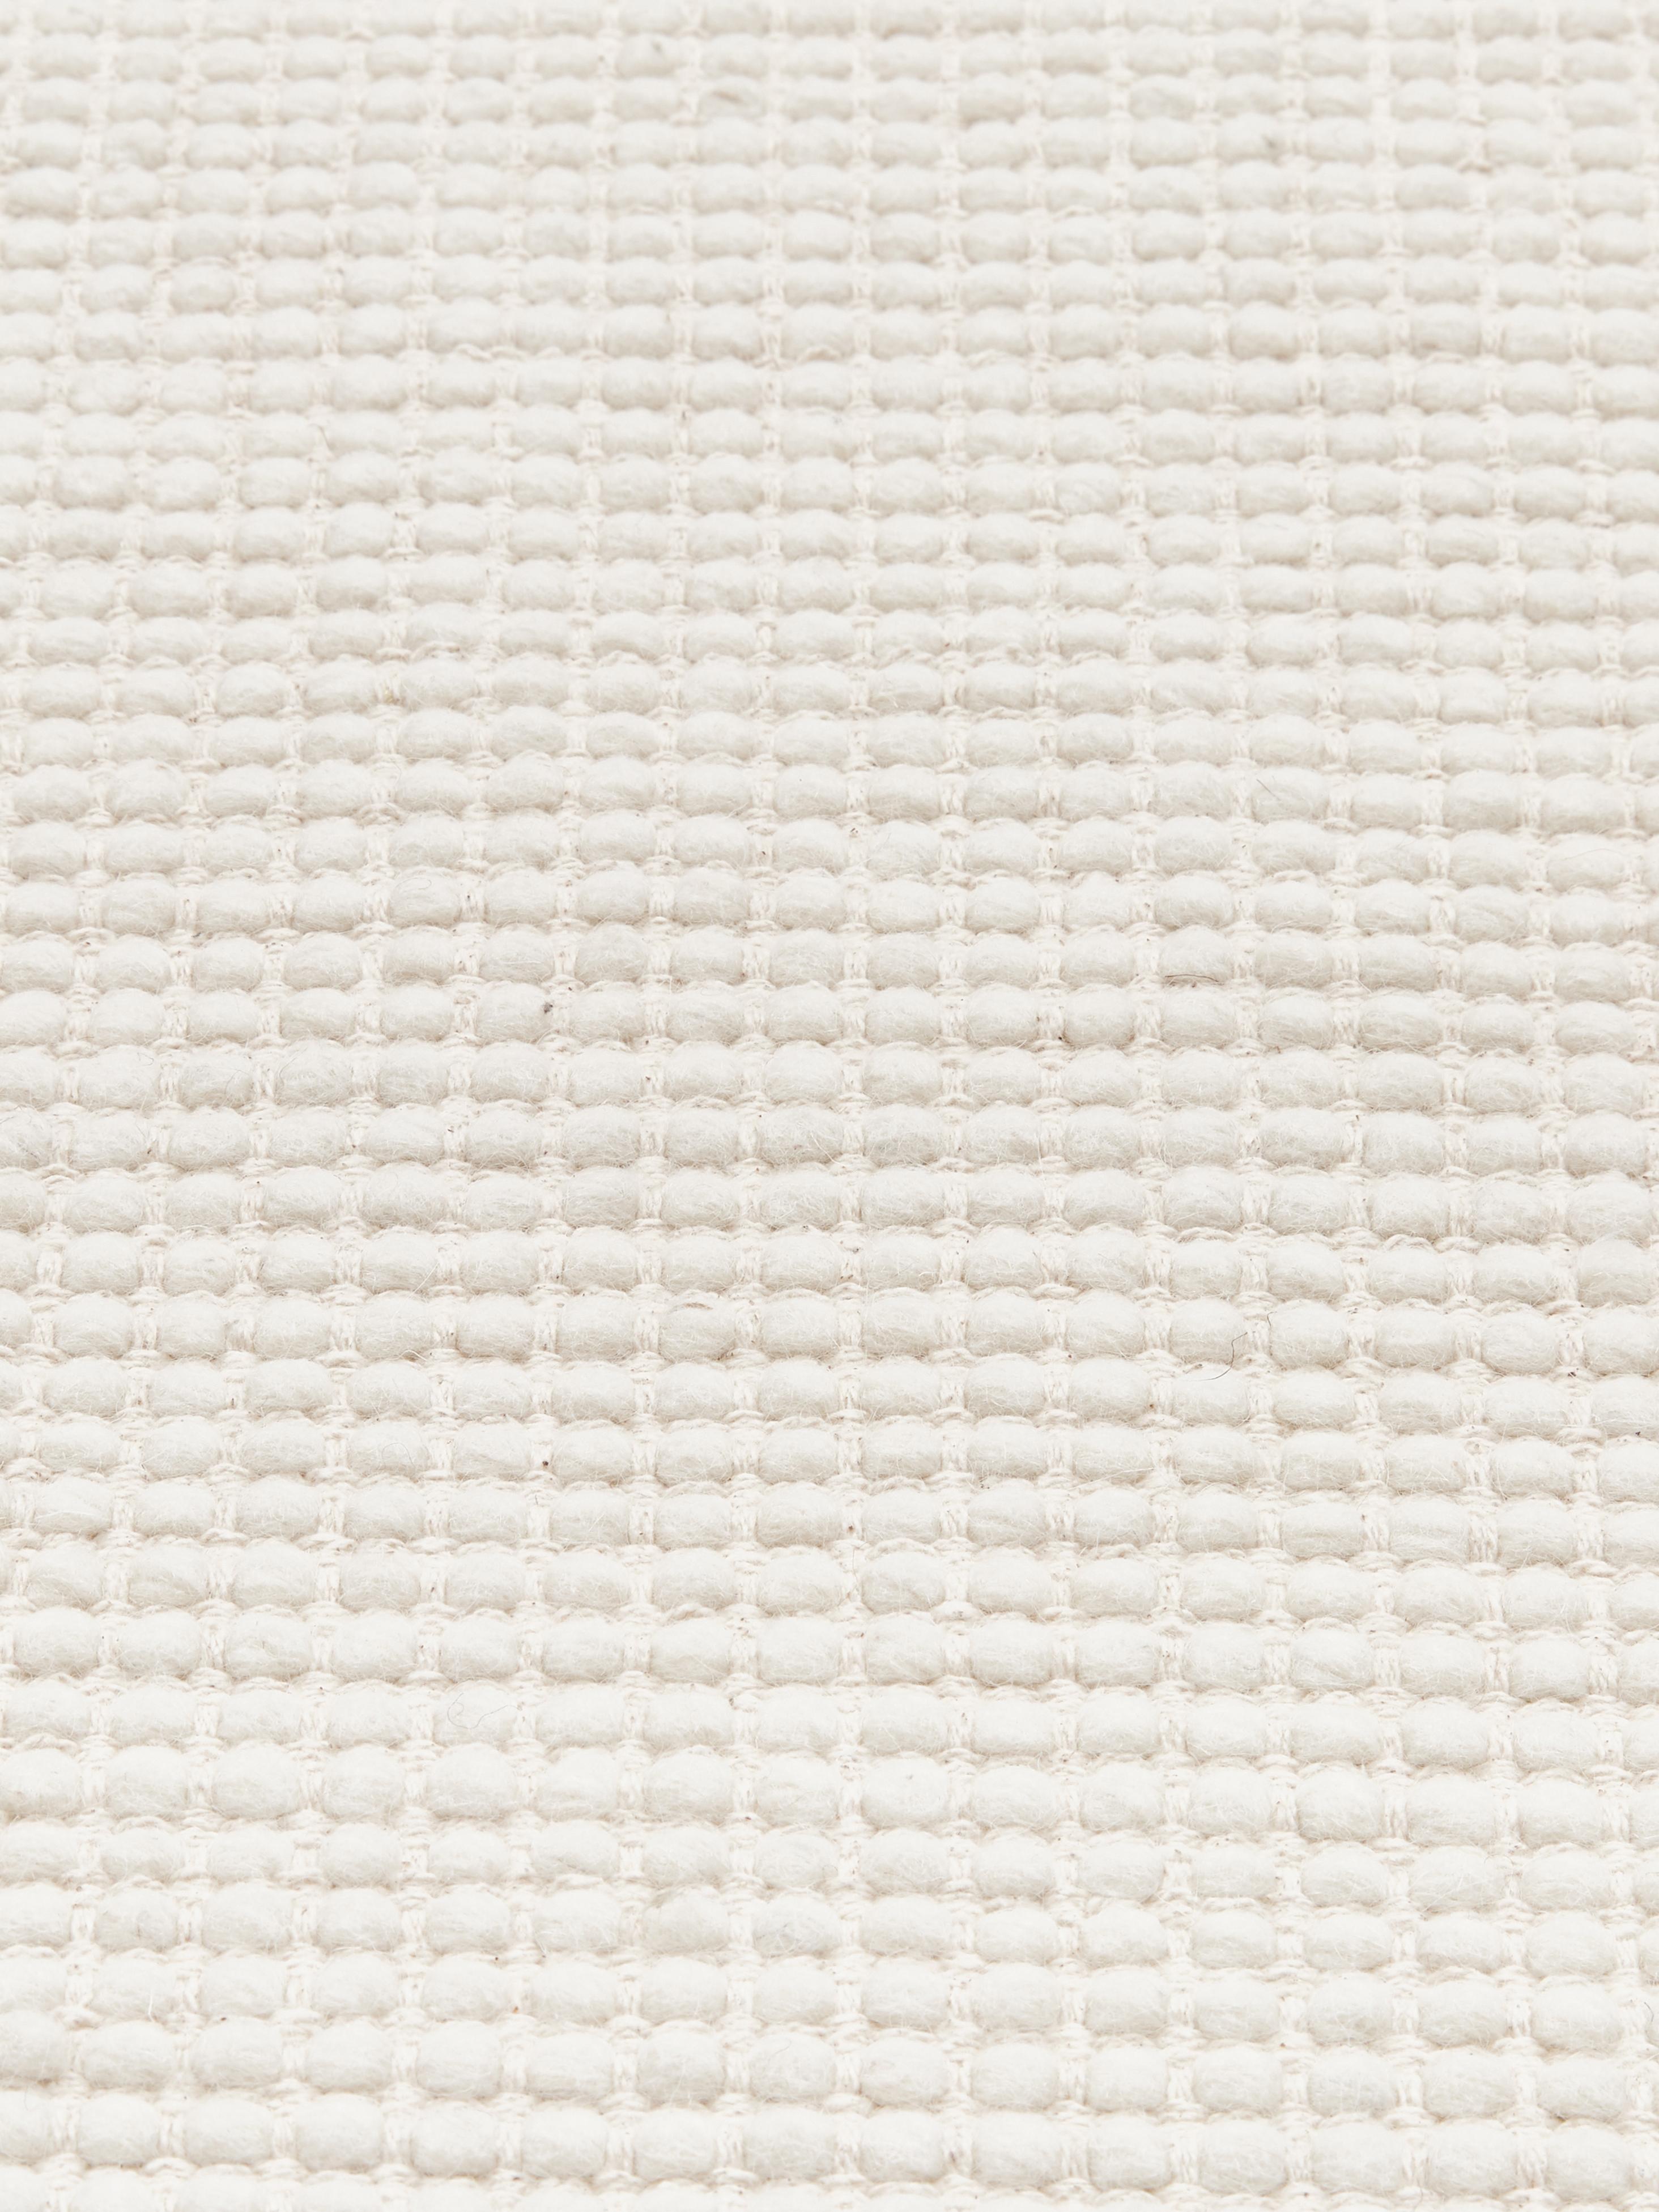 Handgeweven wollen vloerkleed Amaro in crème kleur, Crèmewit, B 160 x L 230 cm (maat M)